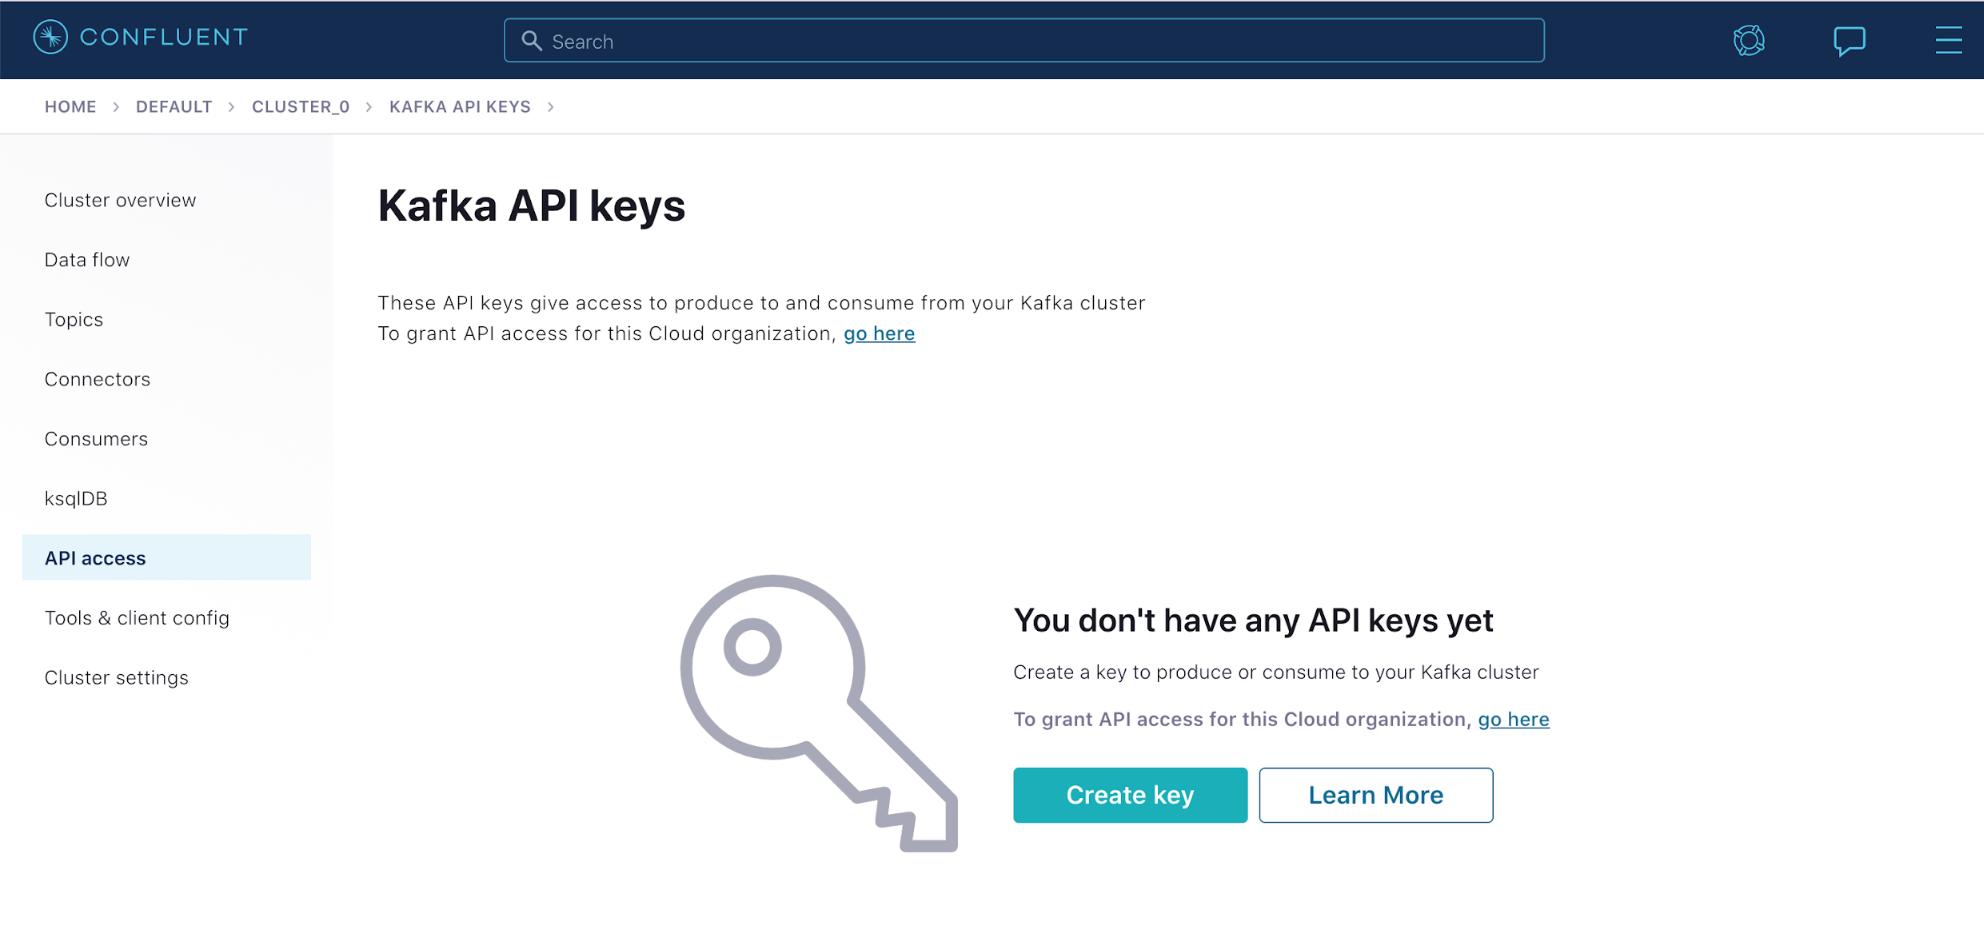 Kafka API keys | Create key